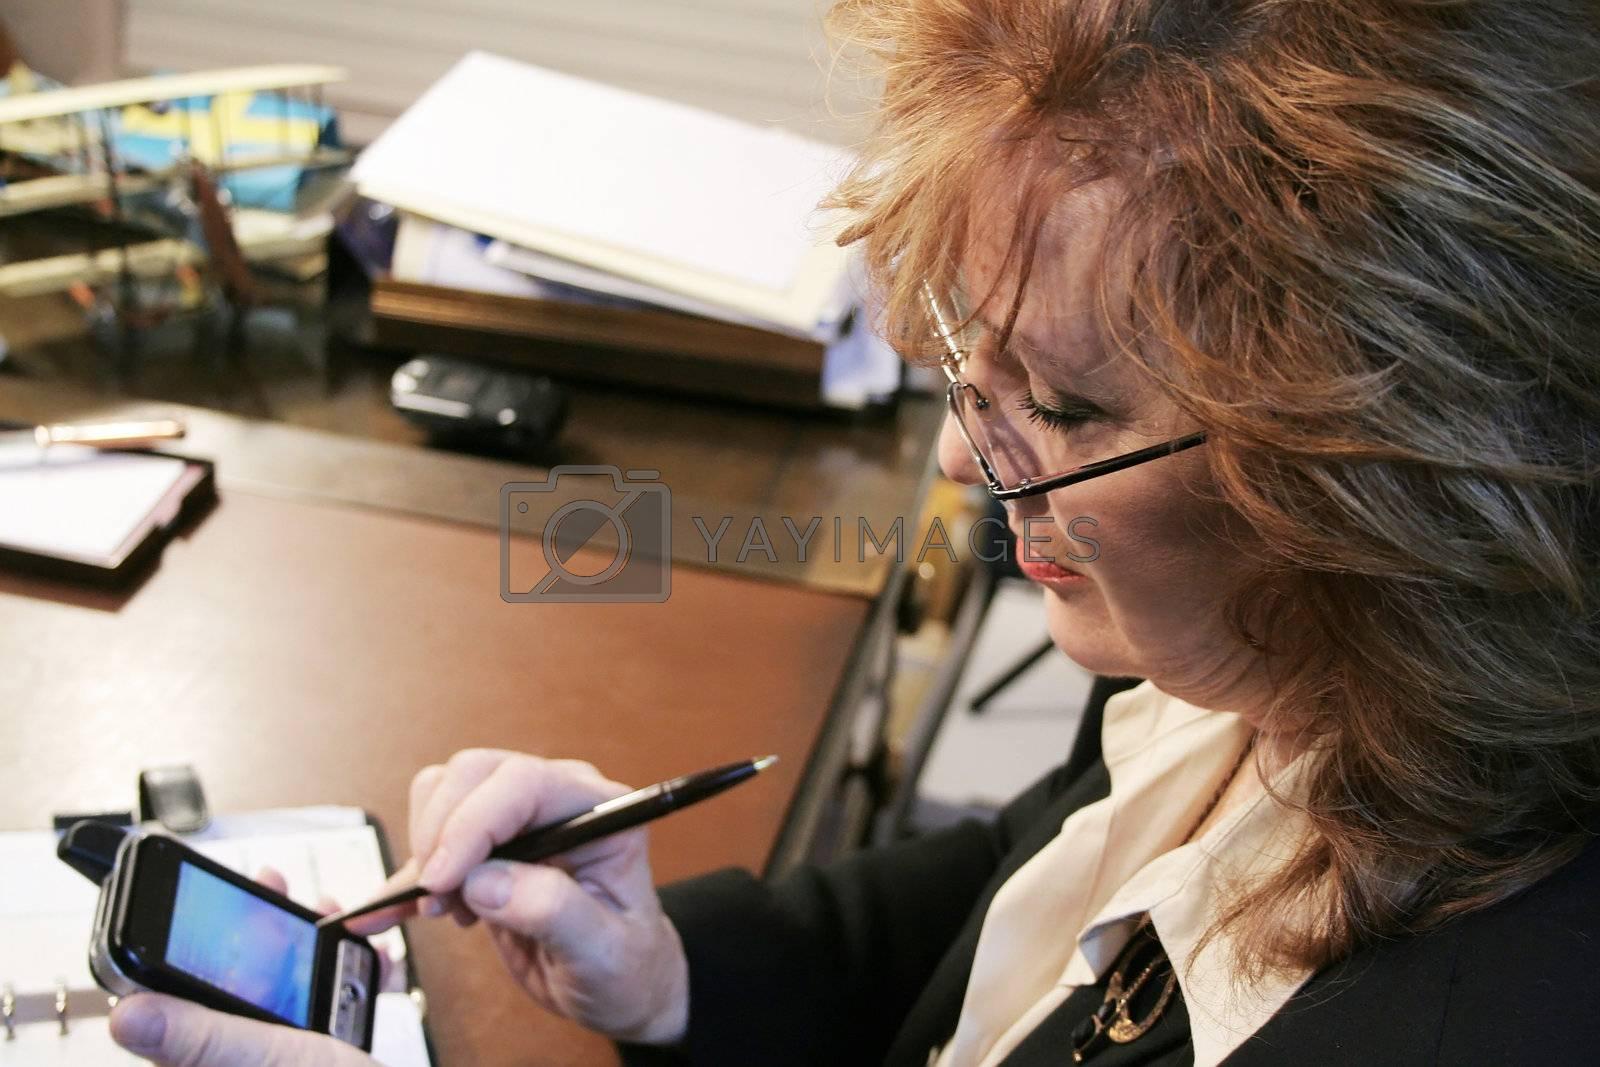 Executive woman typing on PDA screen